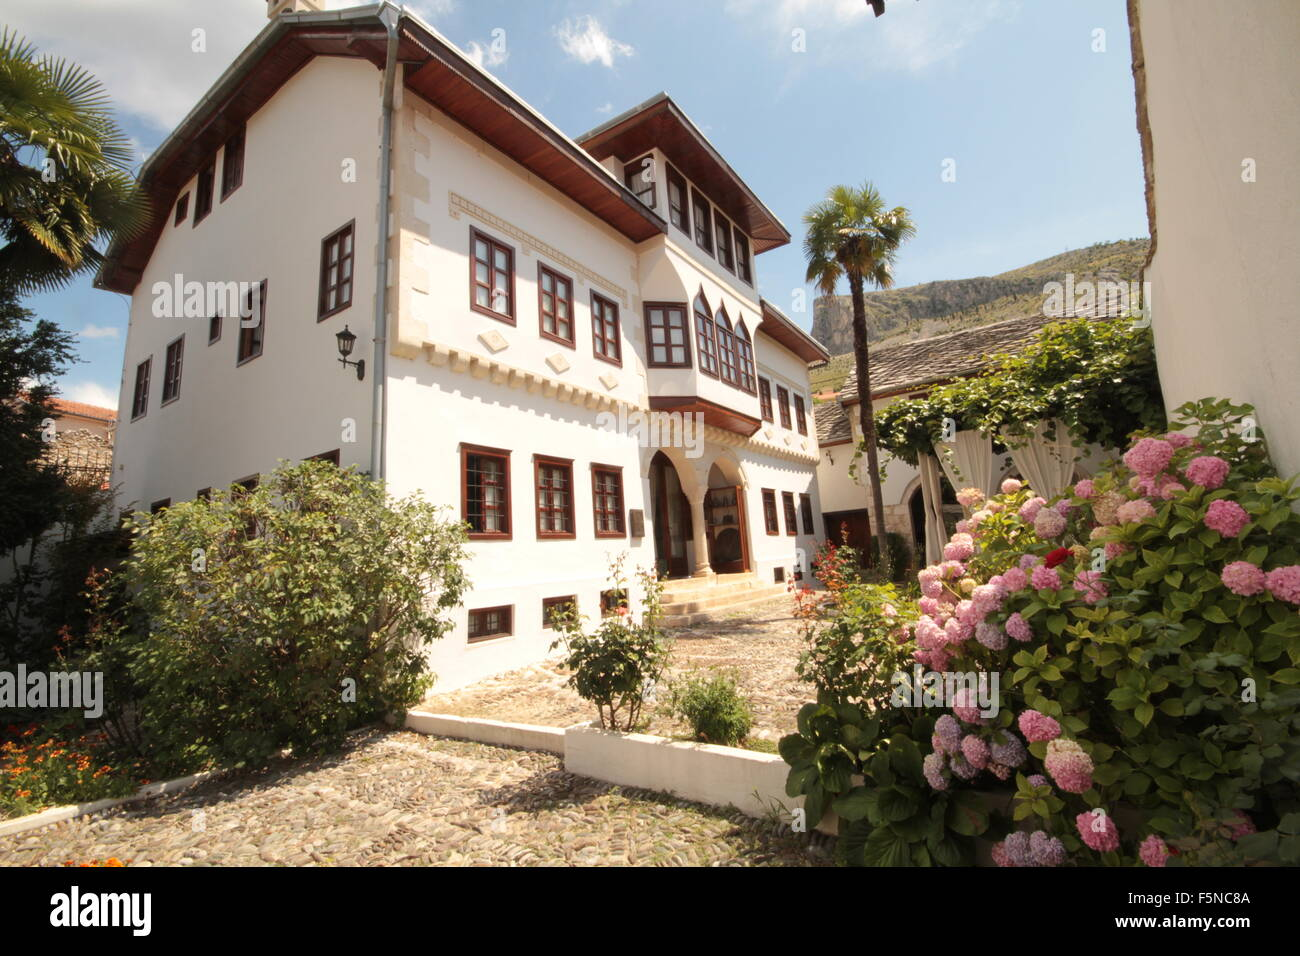 Muselbegovic House Mostar Bosnia - Stock Image